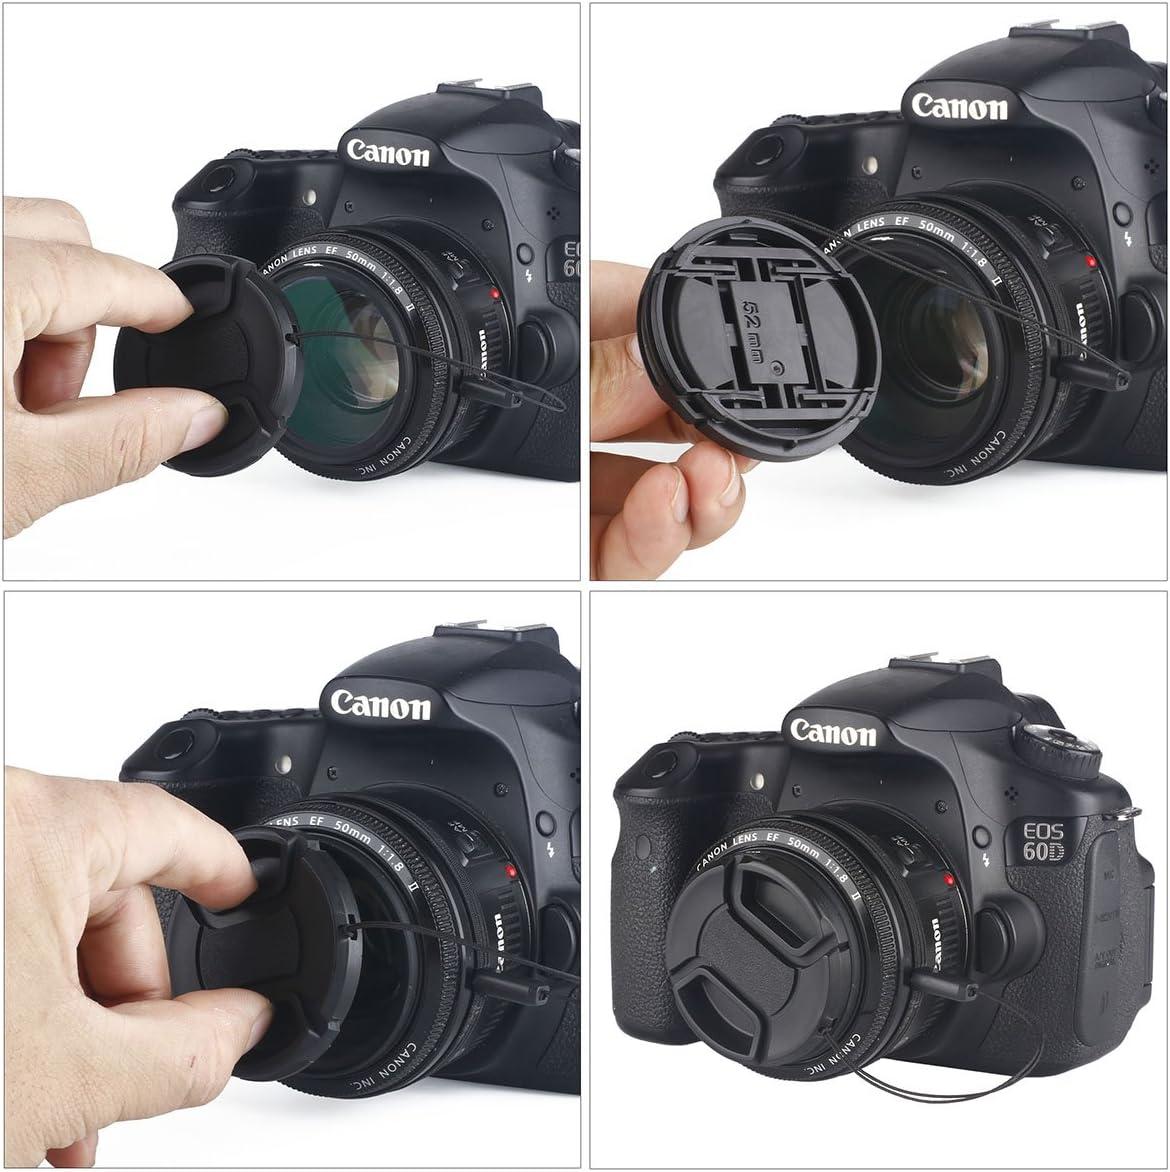 Unique Design Lens Cap Bundle Microfiber Cleaning Cloth 3 Pcs 58mm Center Pinch Lens Cap and Cap Keeper Leash for Canon Nikon Sony DSLR Camera